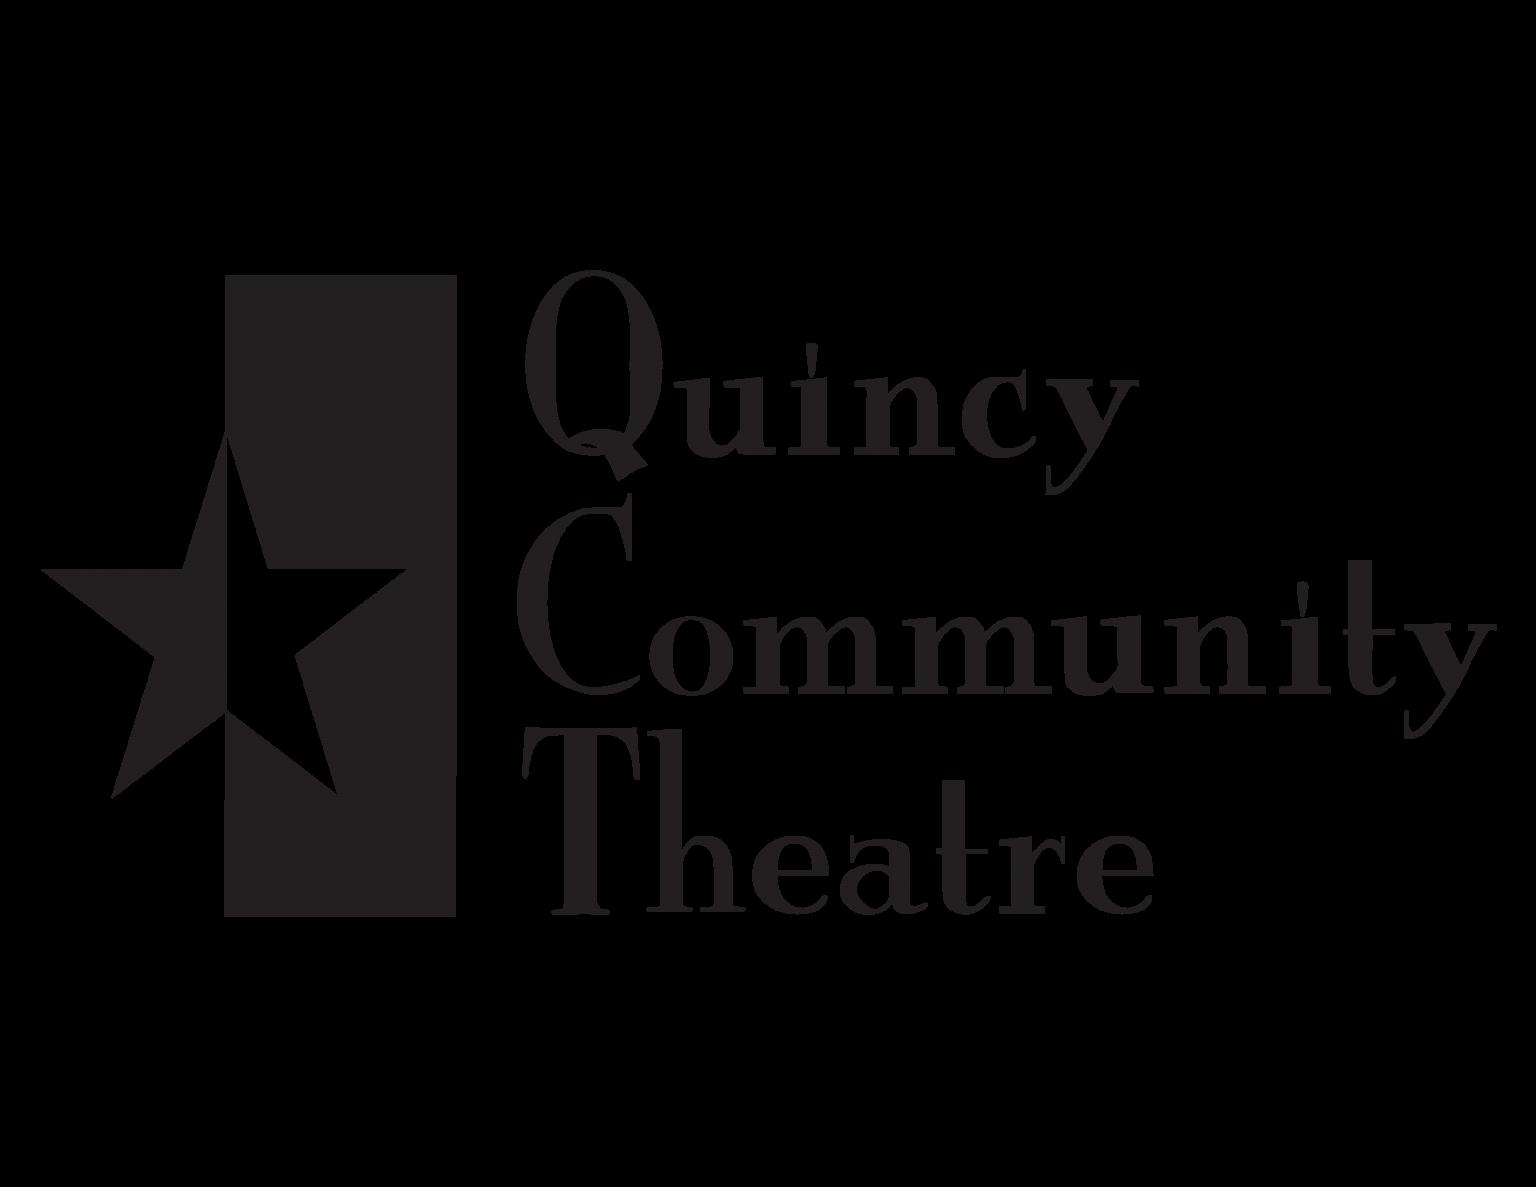 qct_logo